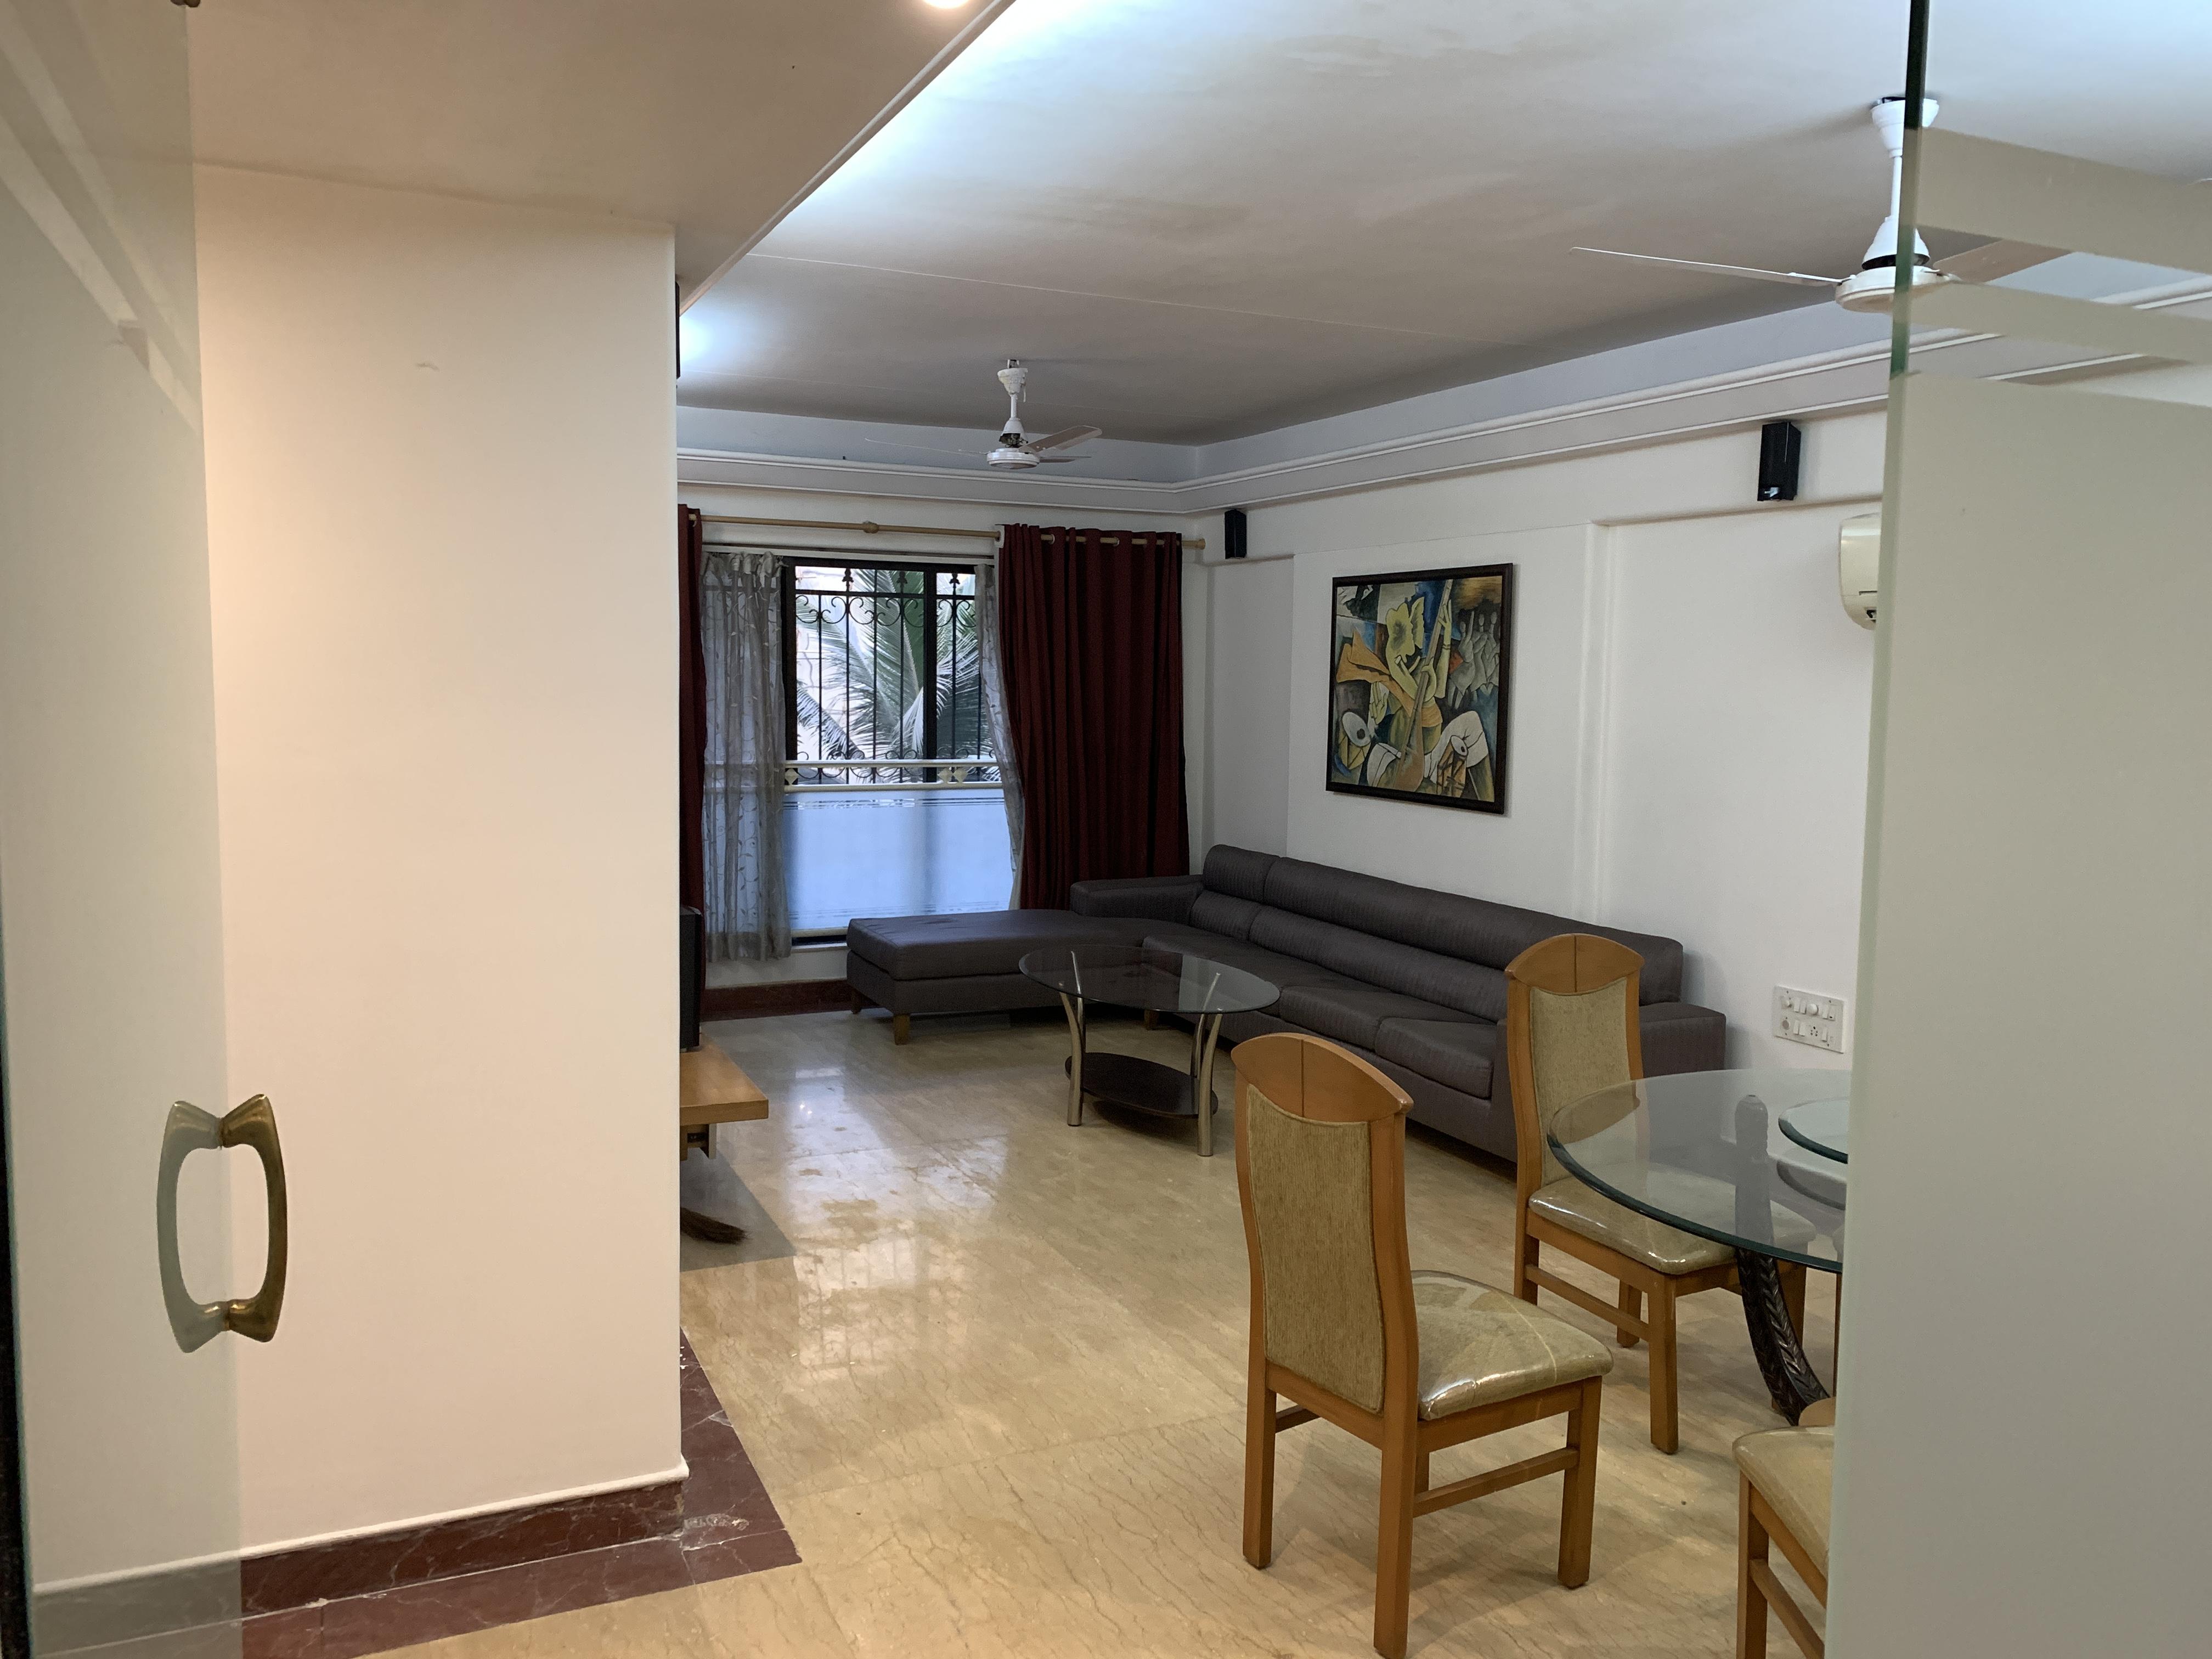 Flat on rent in HEERA, Khar West